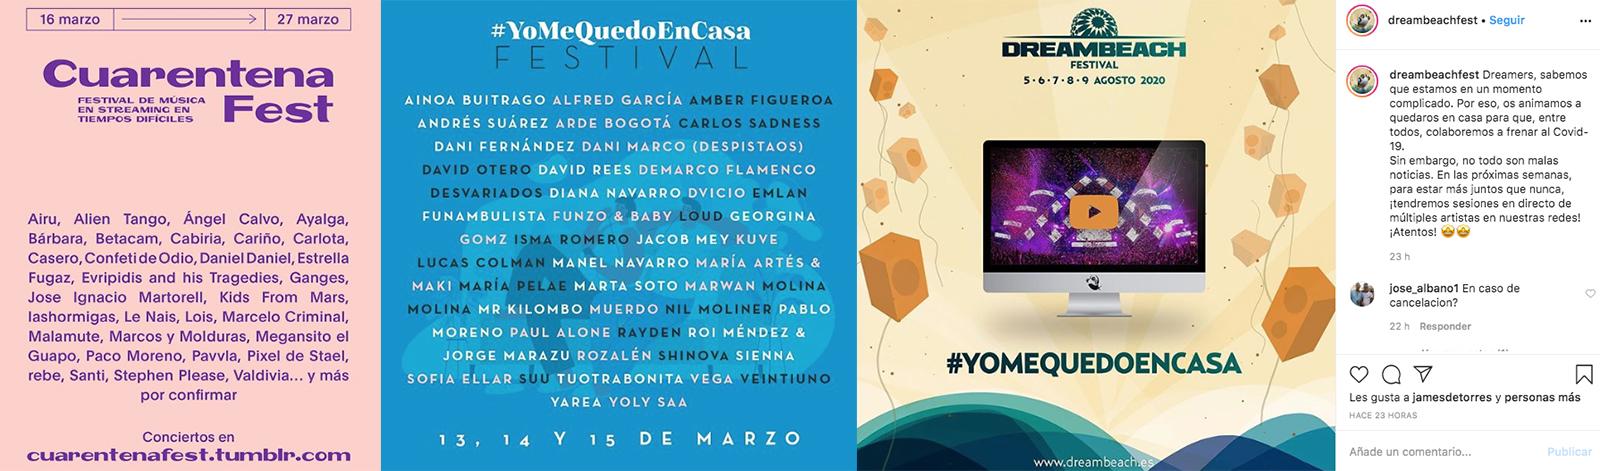 yomequedoencasa-festivales